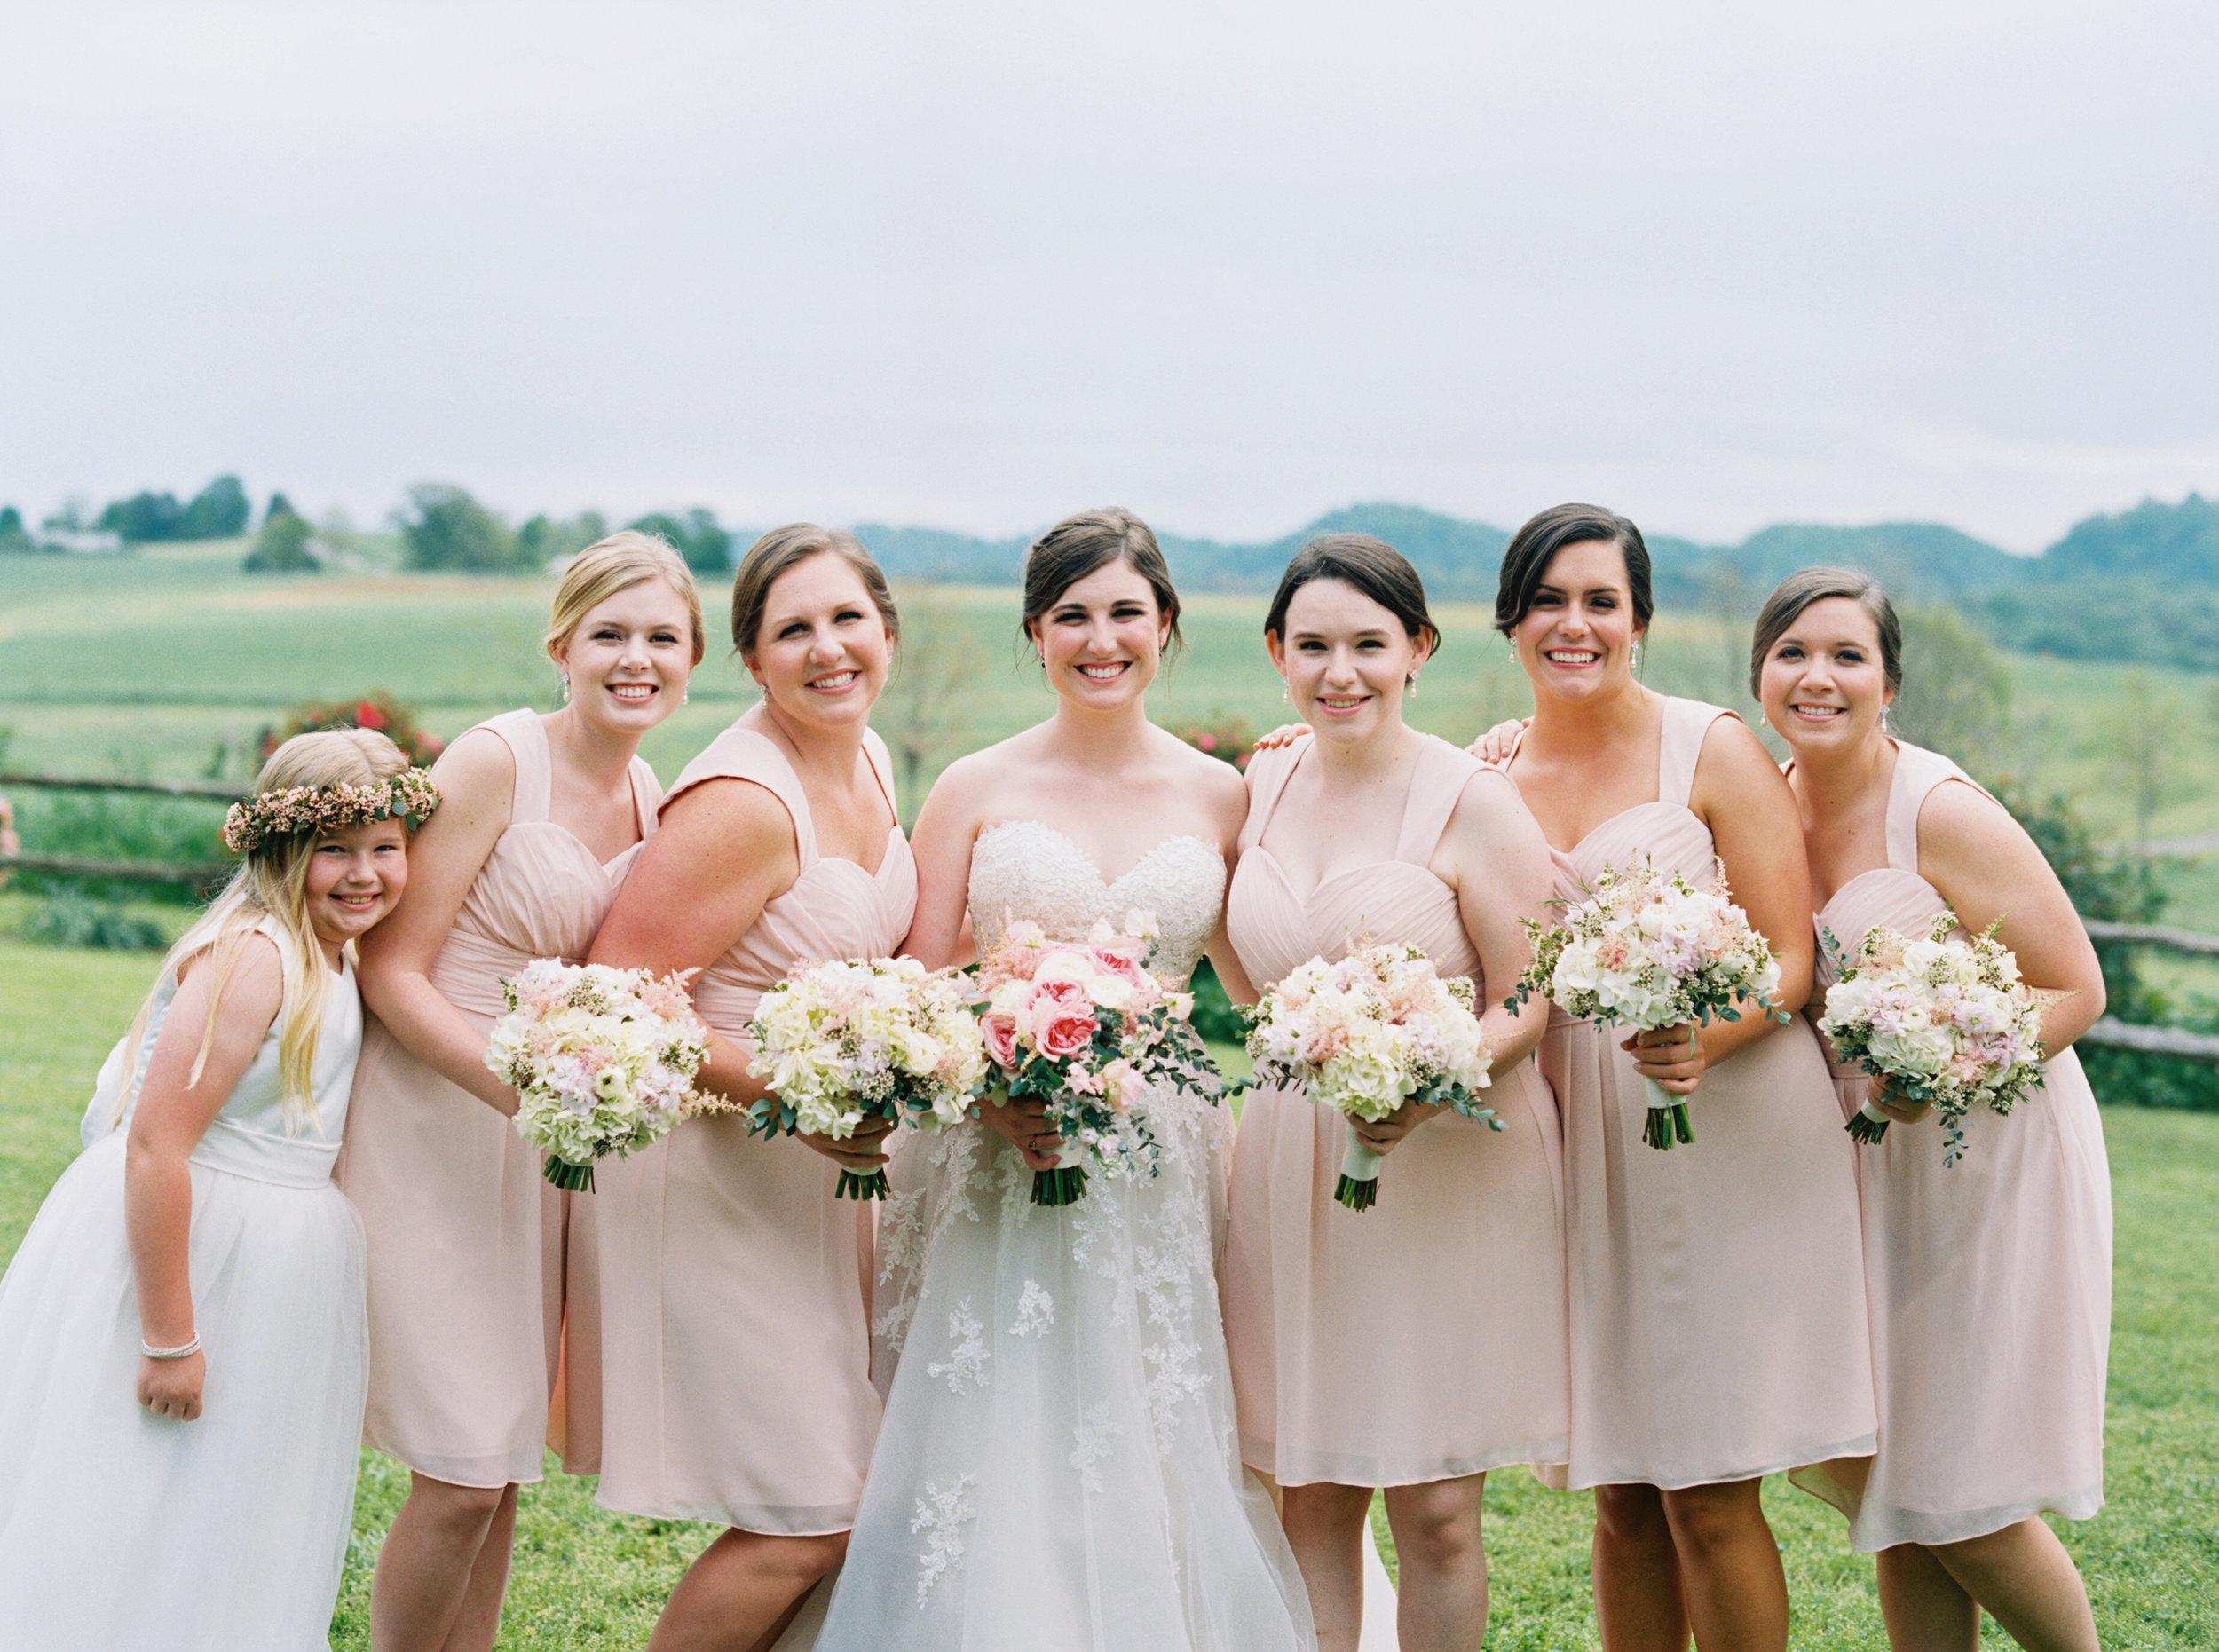 Lydia_johnathan_Wedding_Abigail_Malone_Photography-303.jpg